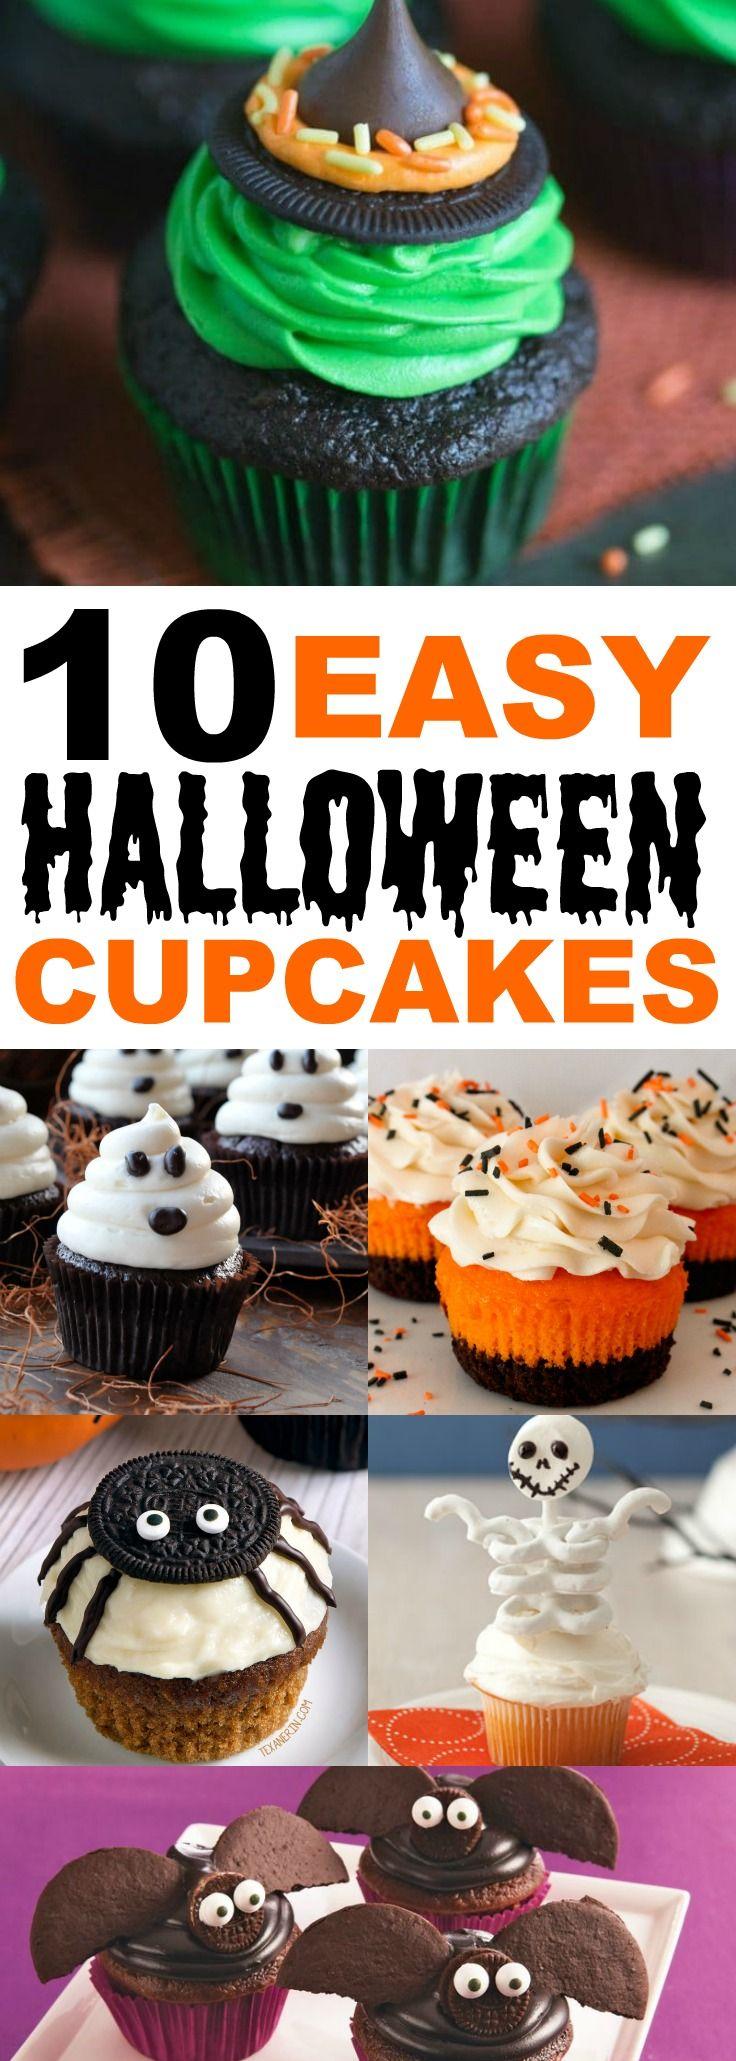 10 Easy Halloween Cupcake Ideas, Halloween desserts, #trickortreat, halloween potluck food, Halloween cupcakes